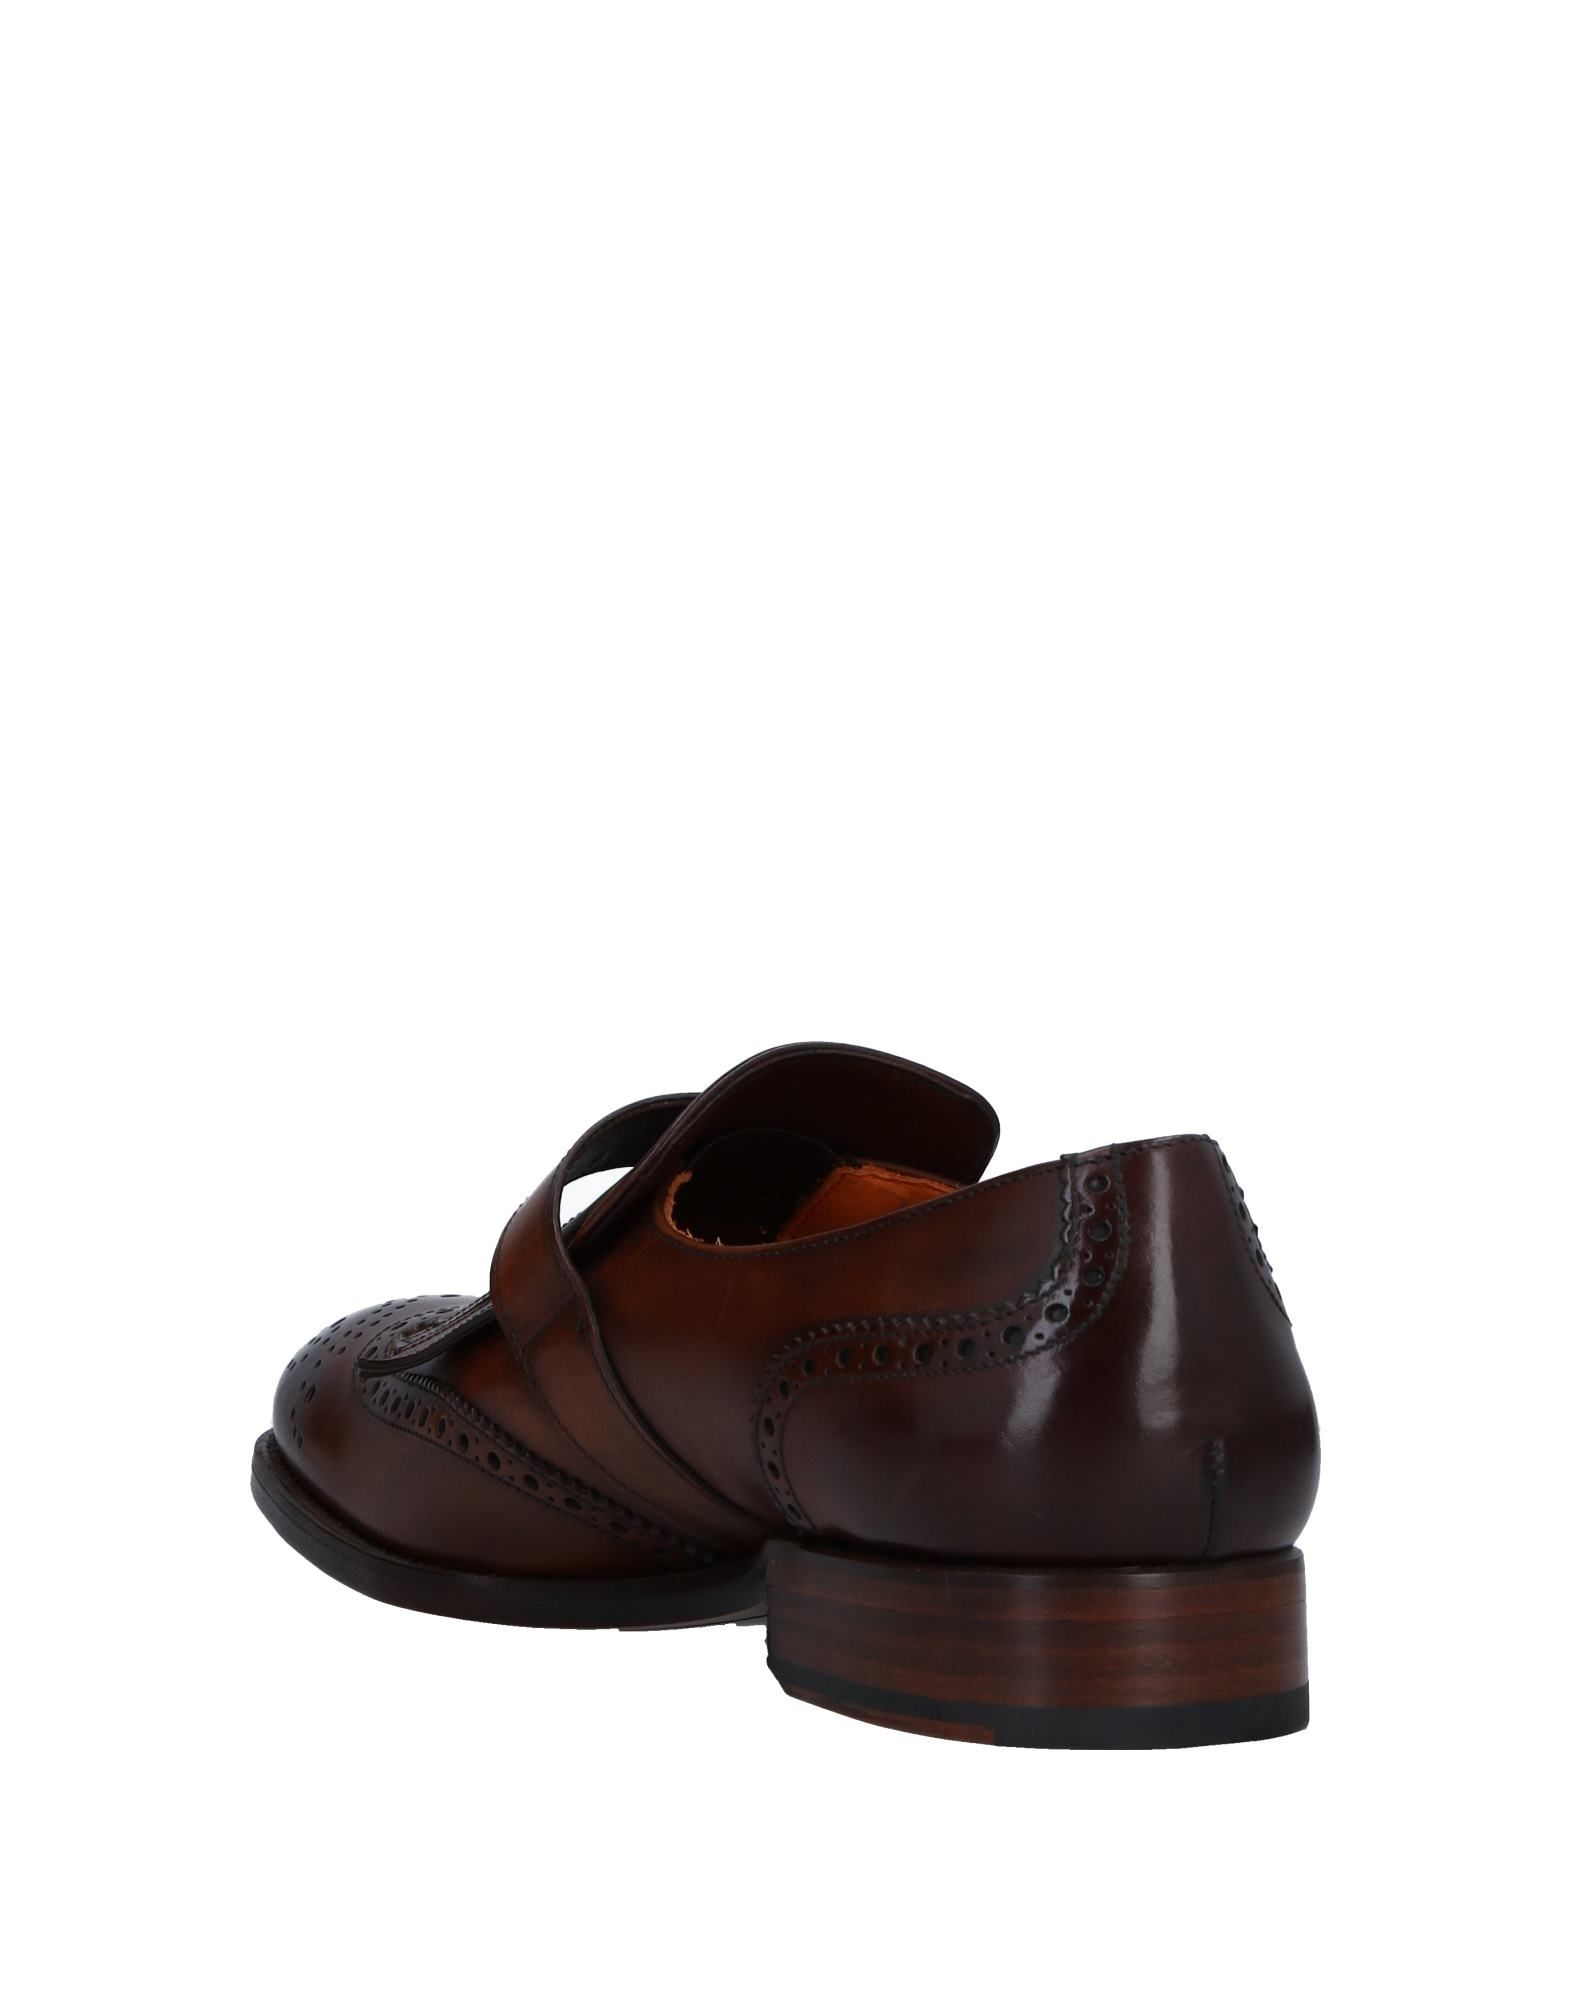 Cordwainer Gute Mokassins Herren  11534621VX Gute Cordwainer Qualität beliebte Schuhe c197aa